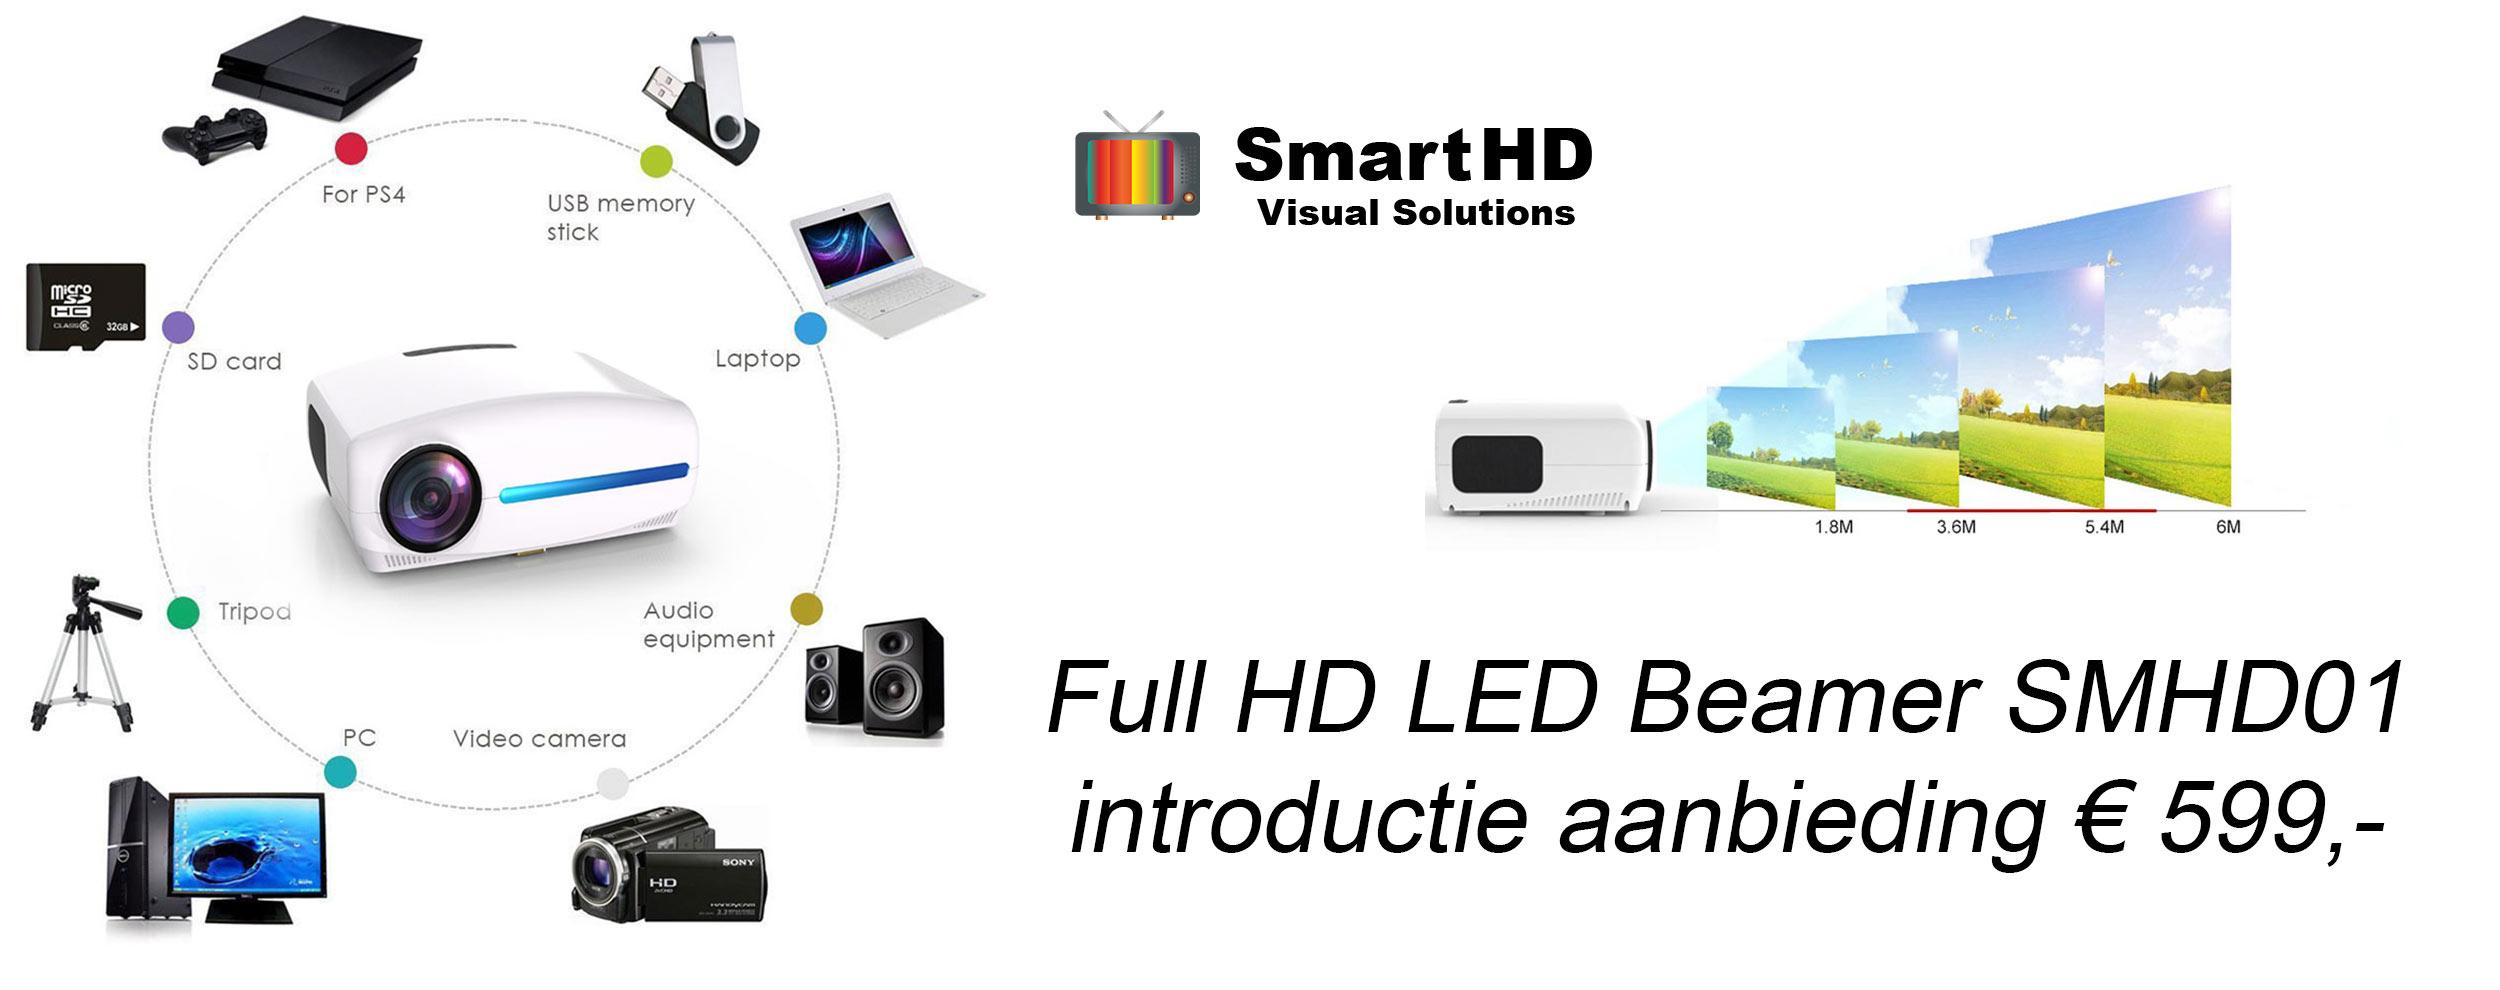 Full HD LED Beamer aanbieding